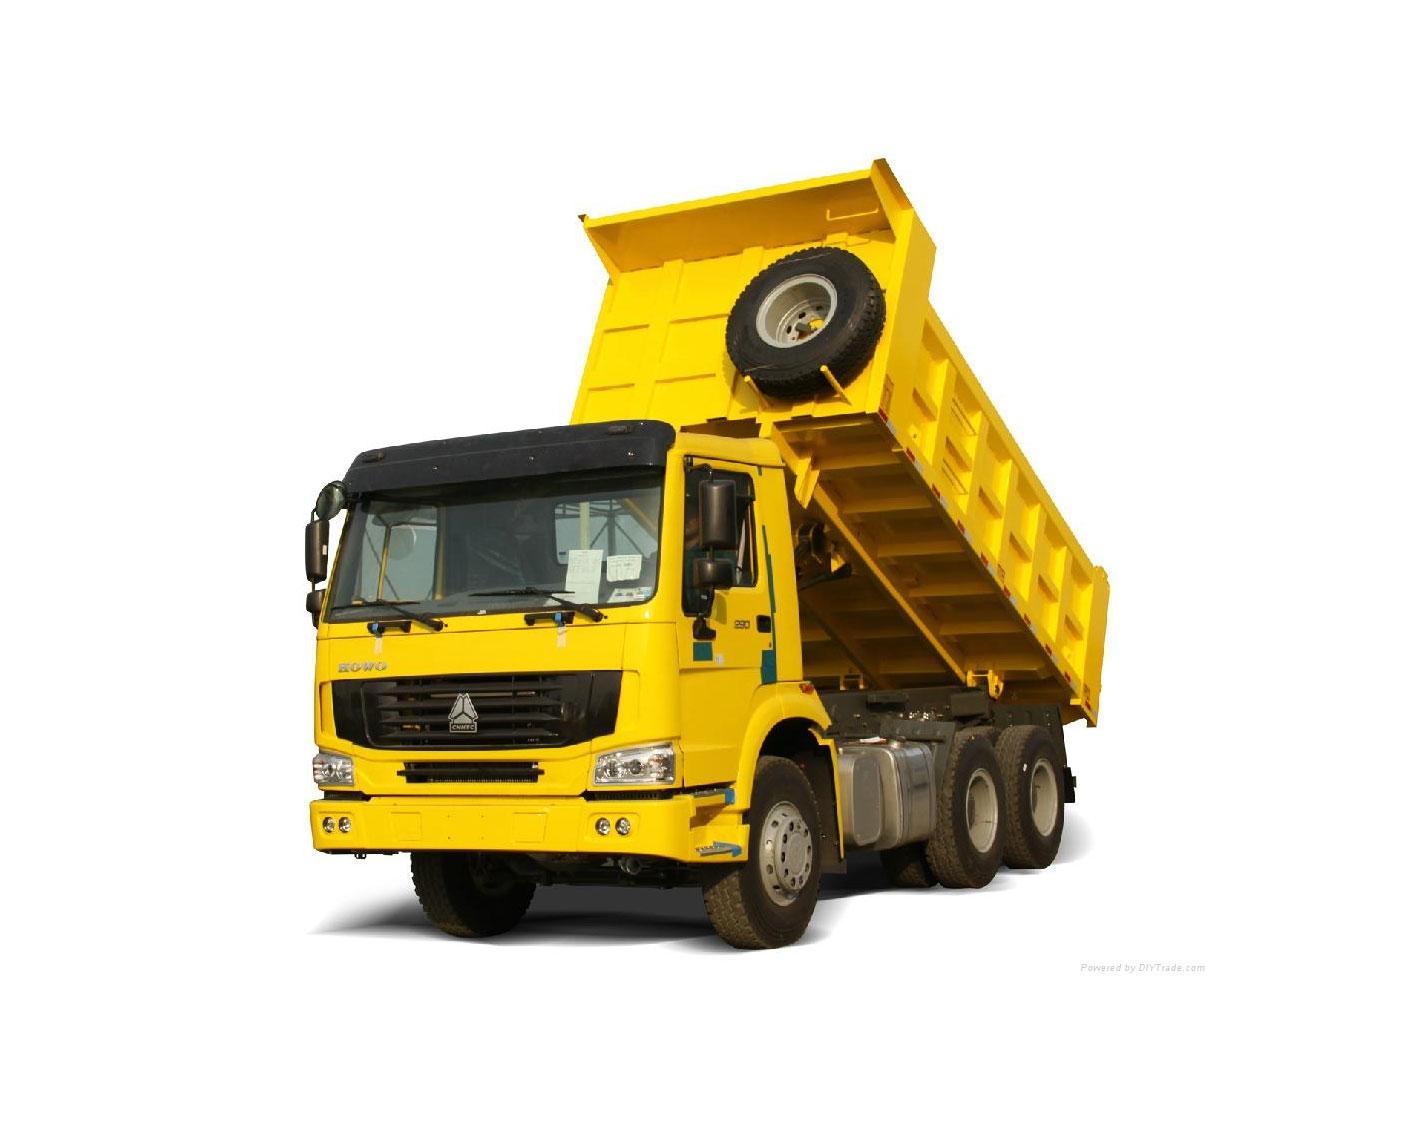 Dumper Truck Rentals in India